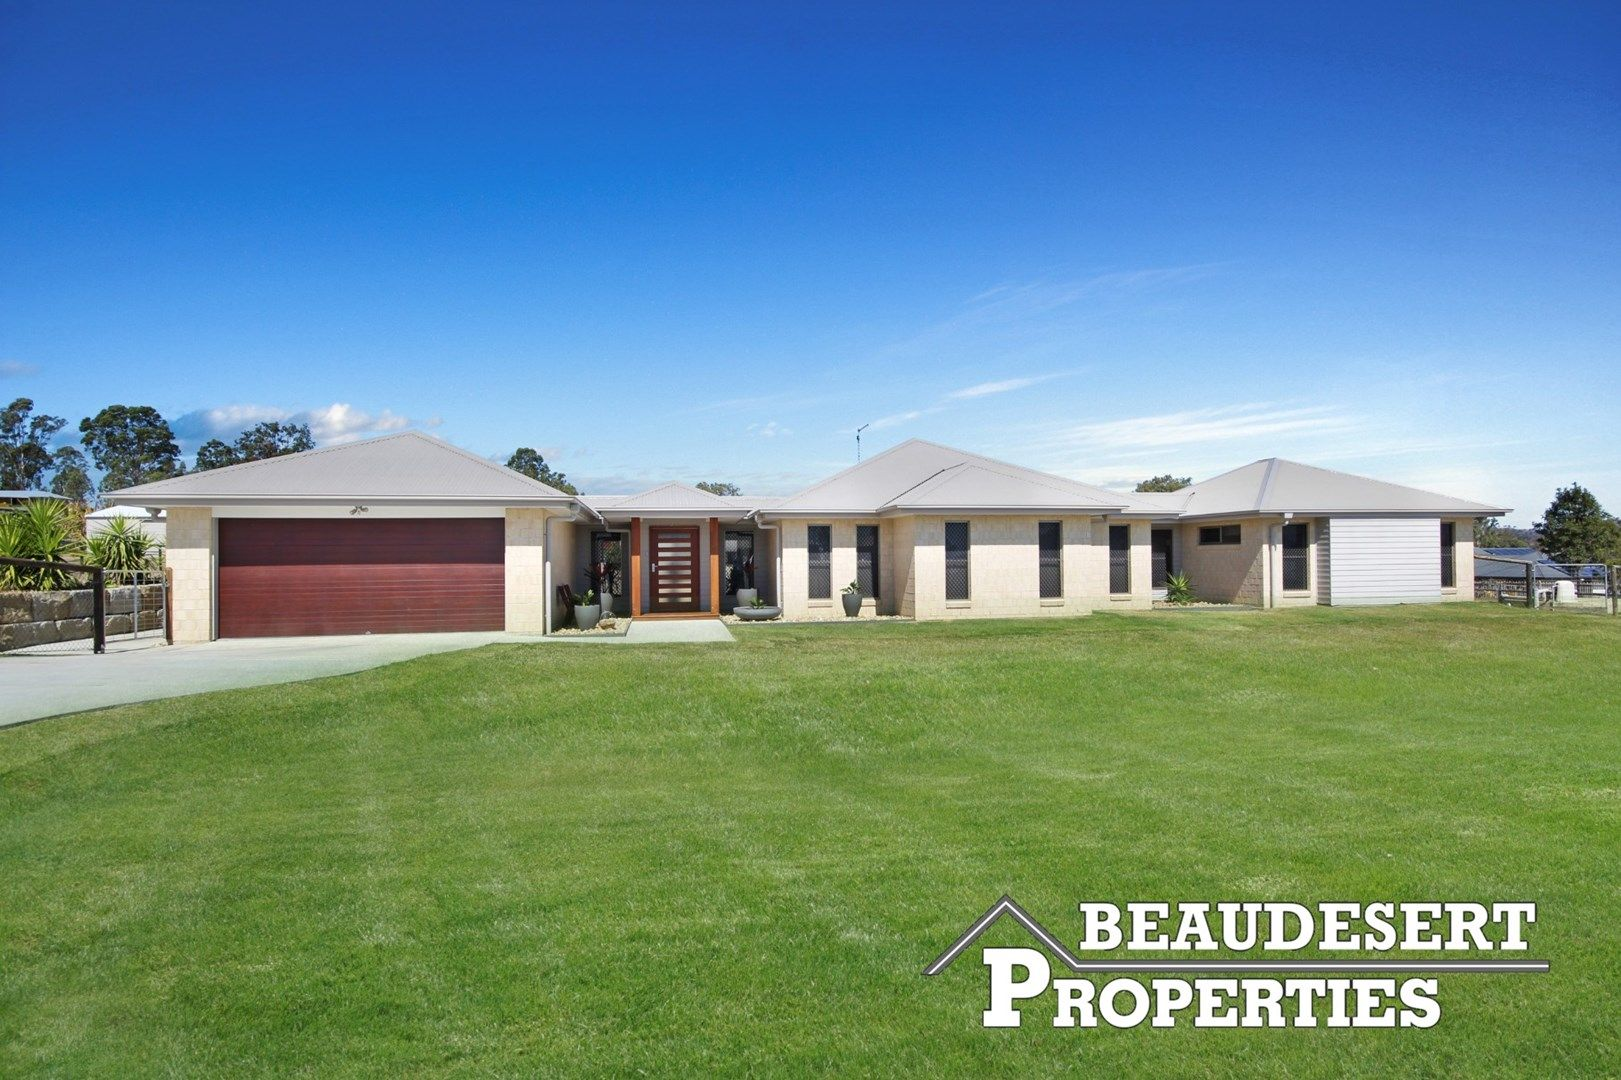 1-5 Sunset Drive, Beaudesert QLD 4285, Image 0